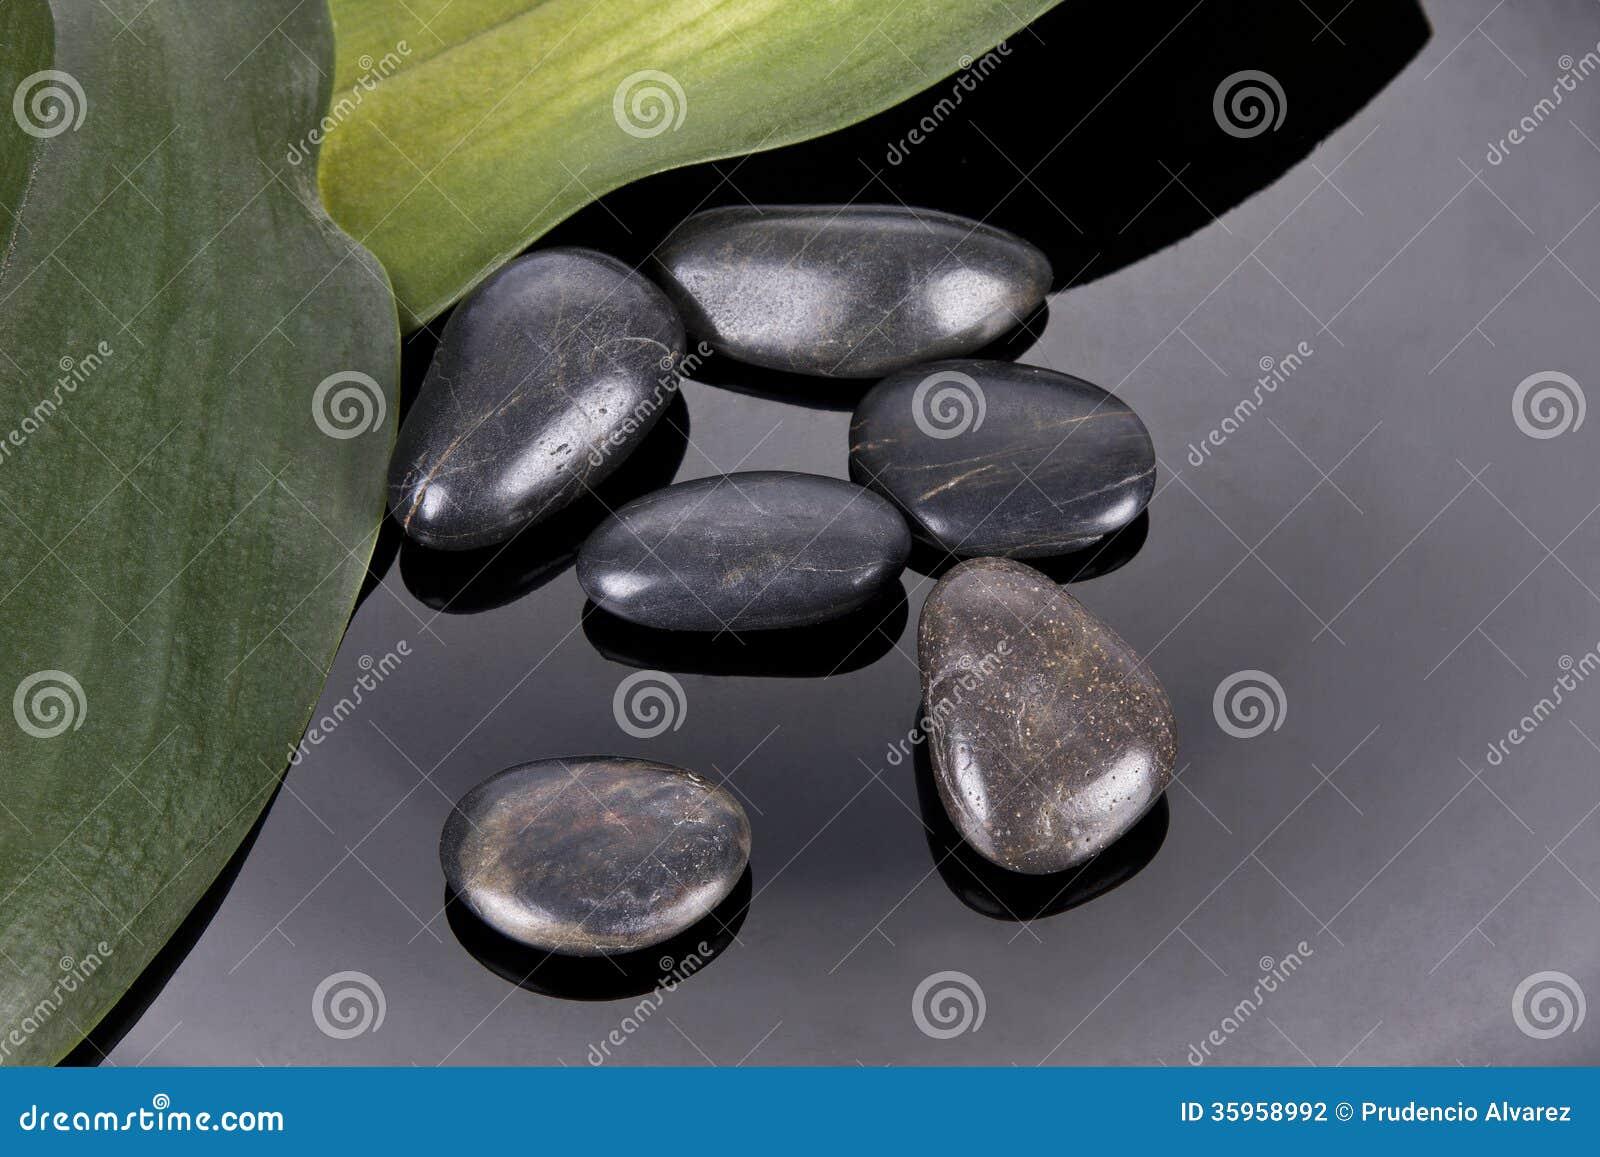 Botella de balneario del aceite del masaje